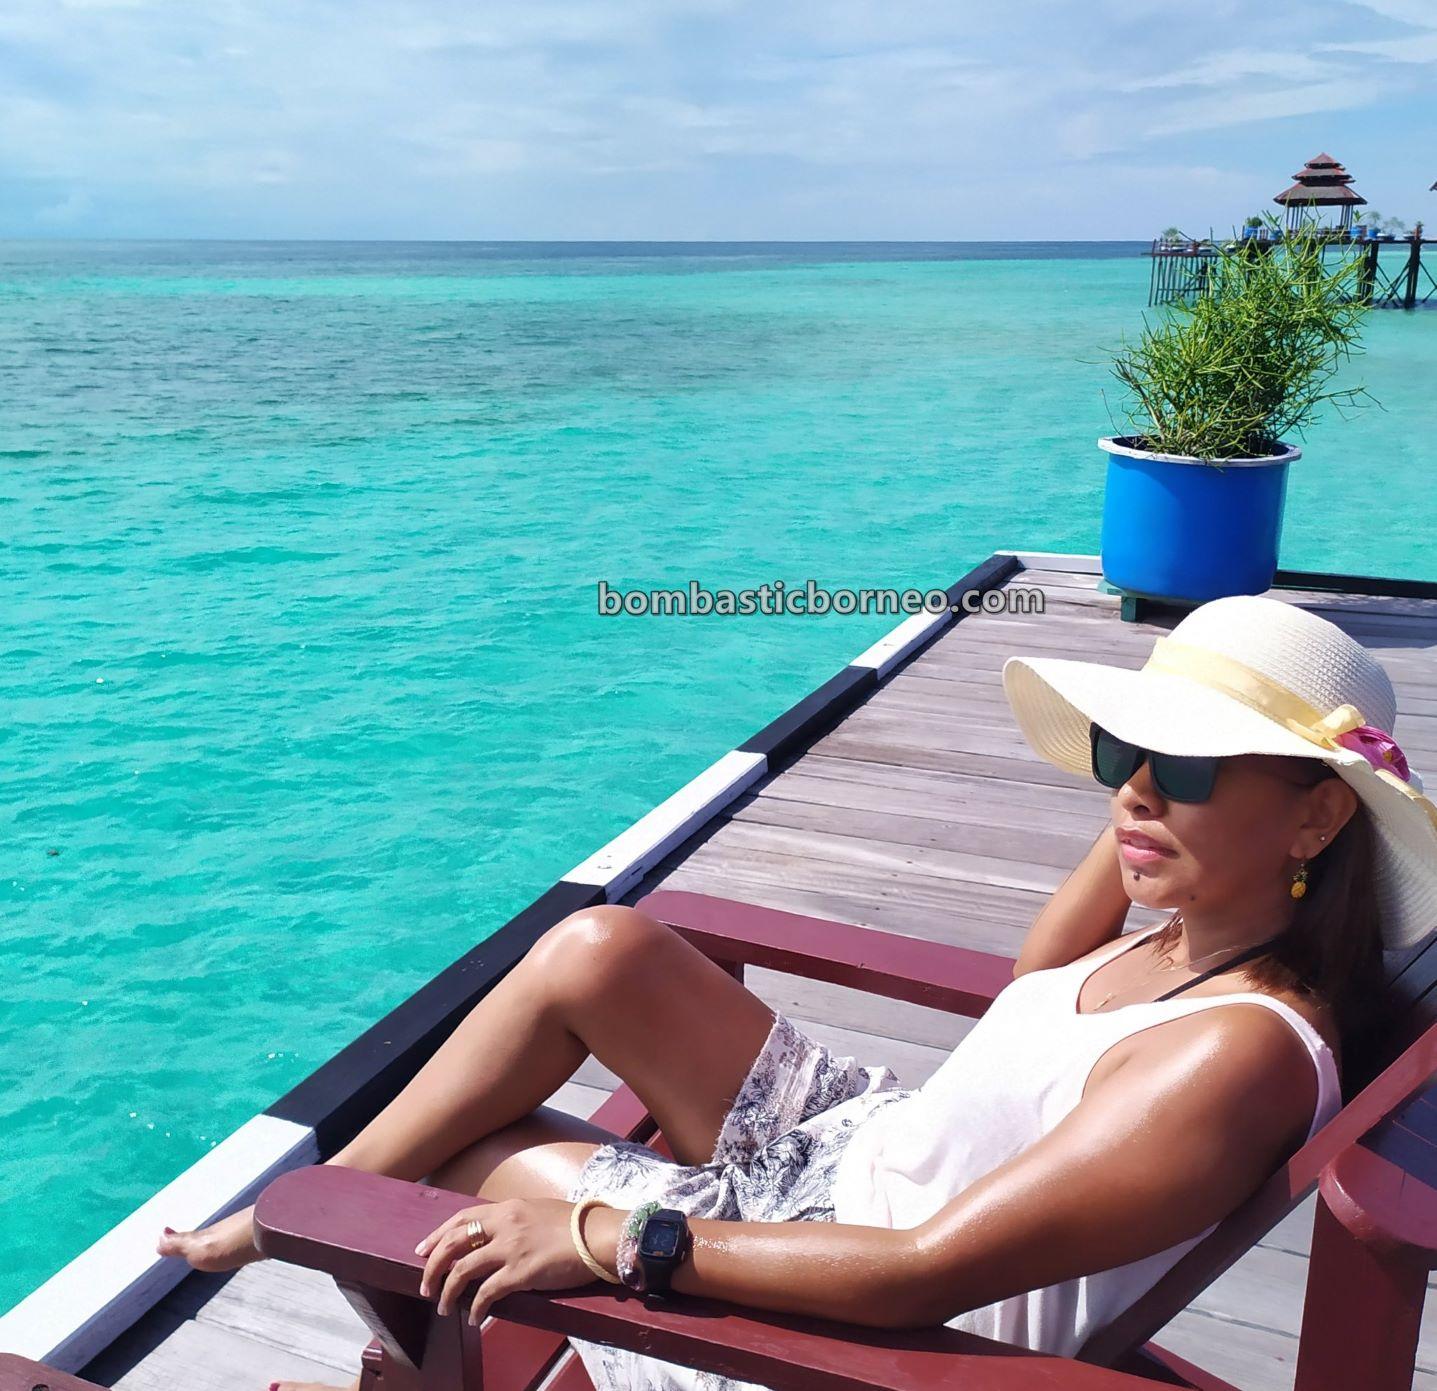 Kepulauan Derawan, Maratua Paradise Resort, backpackers, Destination, diving spot, snorkelling, nature, hidden paradise, vacation, Kalimantan Timur, Indonesia, Wisata Alam, Tourism, travel guide, Trans Borneo,